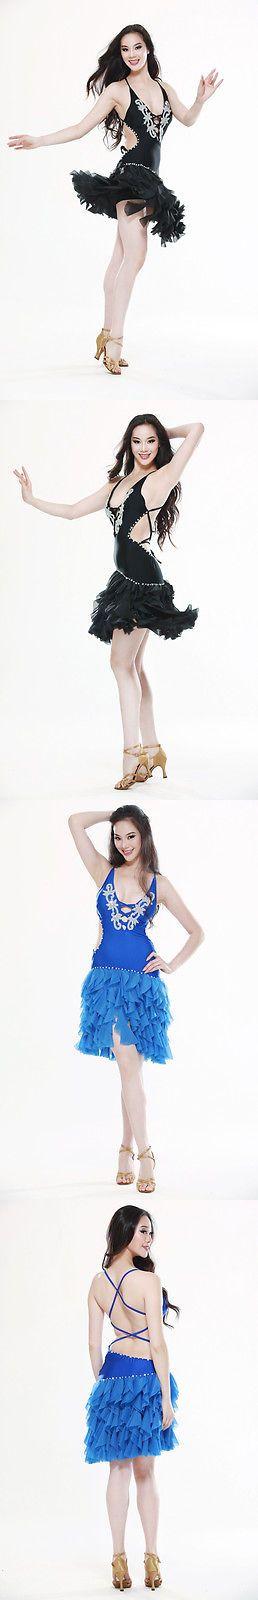 Dancewear: Belly Dance Costume Latin Salsa Tango Cha Cha Ballroom Flamenco Dress 6 Colors -> BUY IT NOW ONLY: $43.89 on eBay!